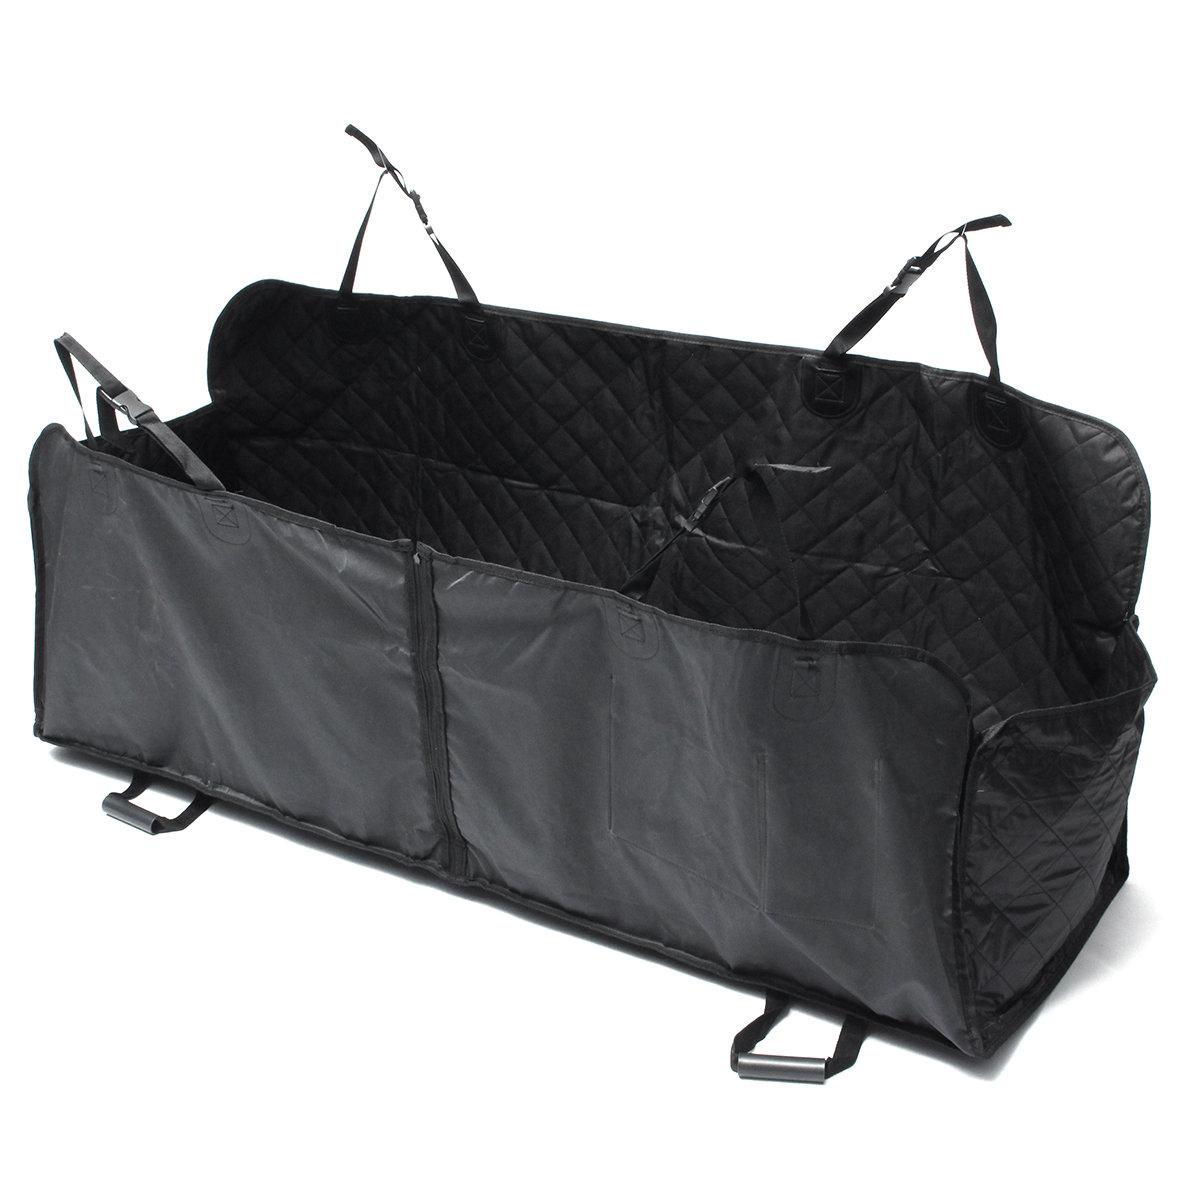 Pet Dog Car Rear Back Seat Protector Hammock Waterproof Safety Mat Cushion Cover